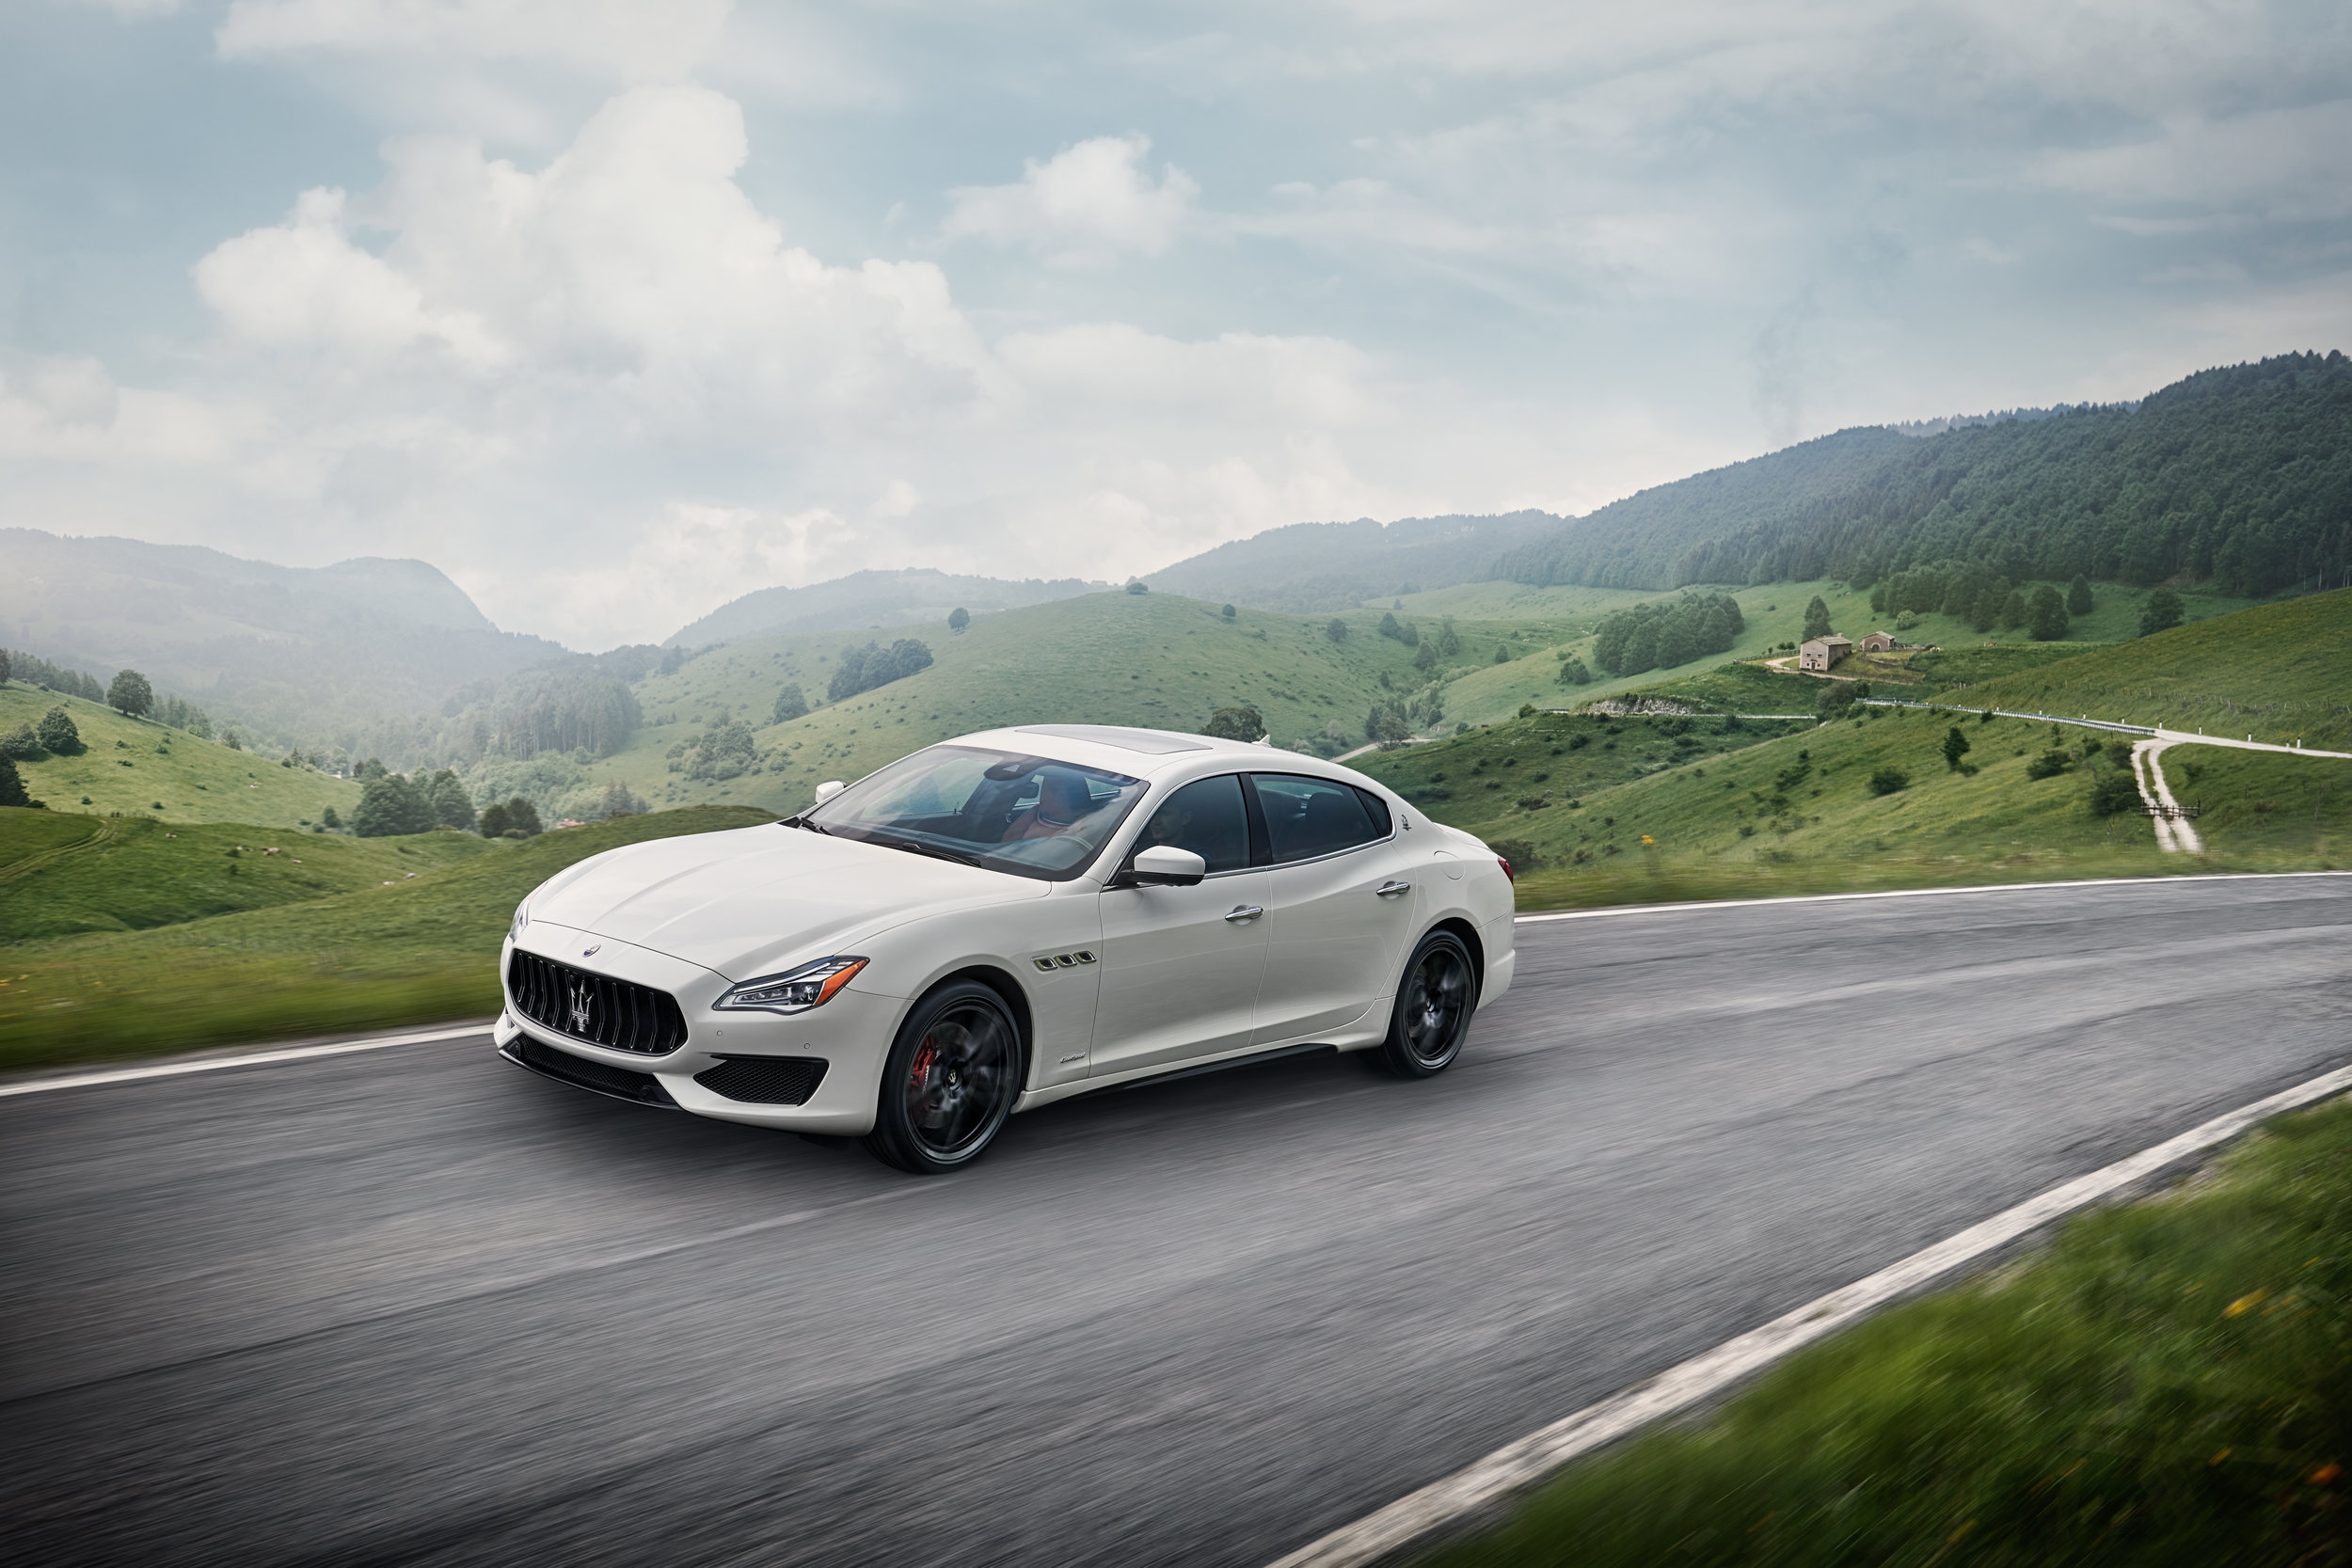 Large-14894-MaseratiQuattroporteGTSMY19GranSport.jpg